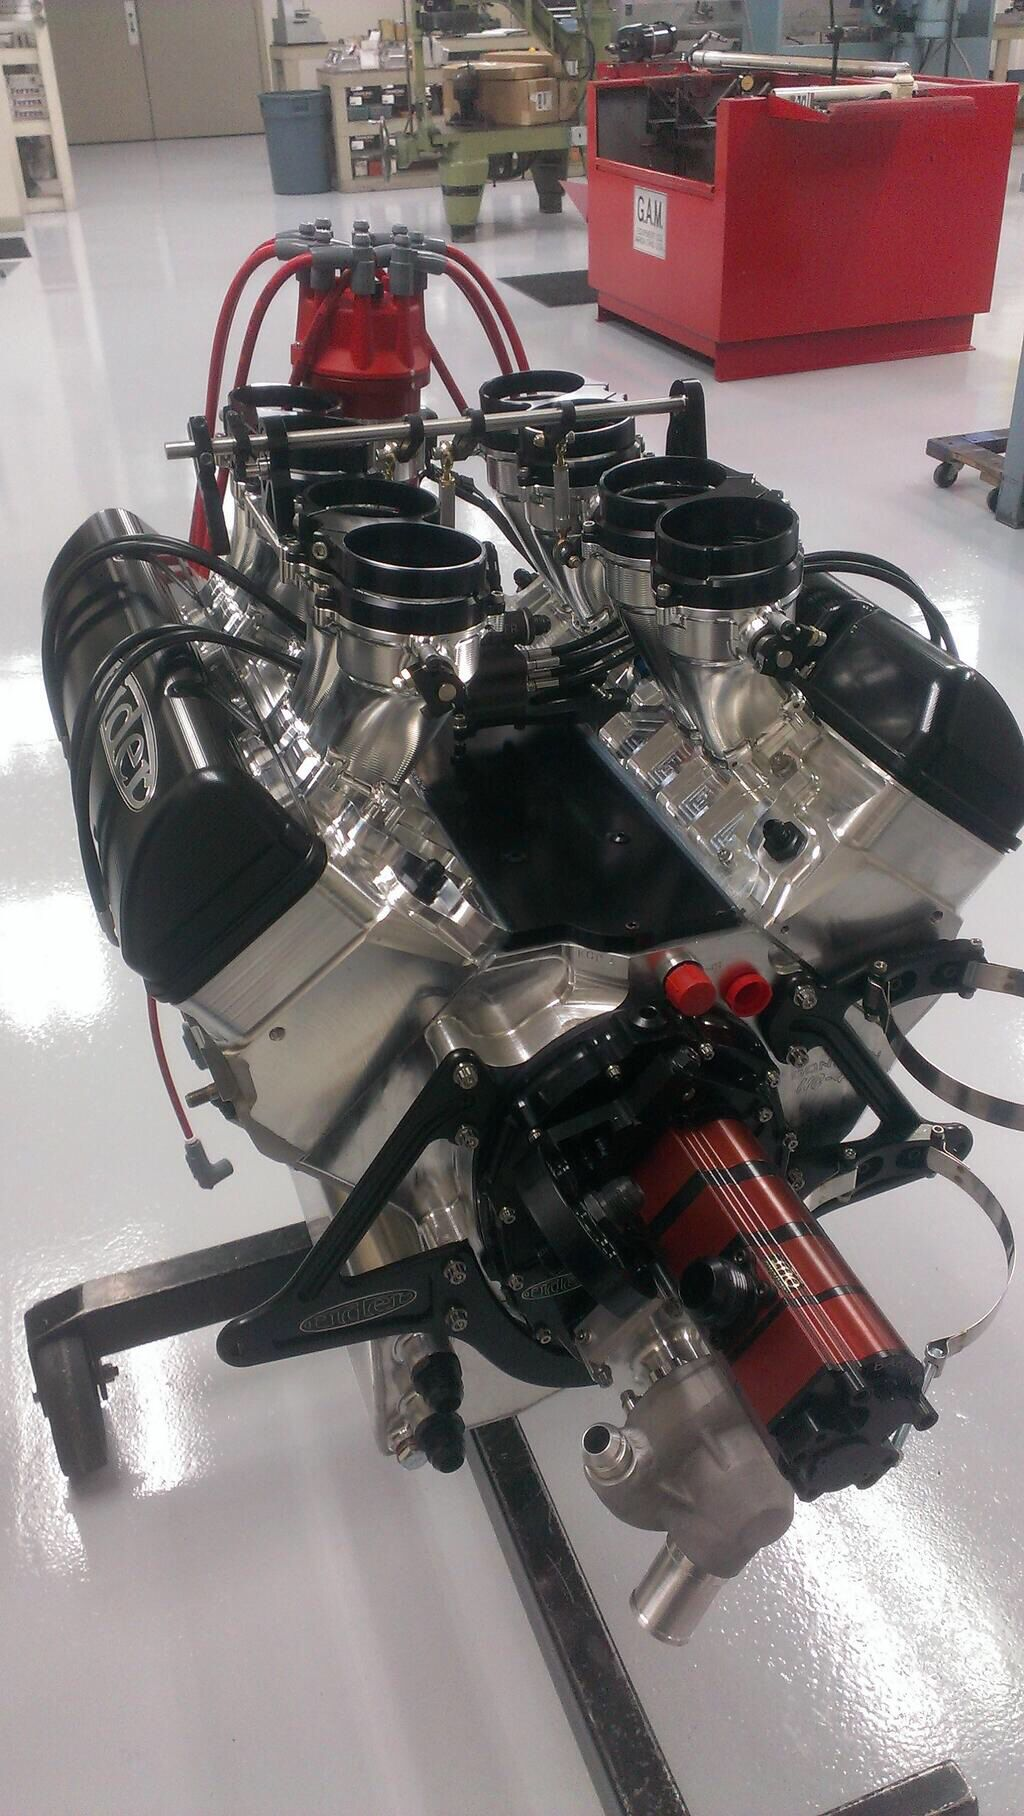 Rider Racing Engines Garage Design Garage Door Torsion Spring Garage Pictures